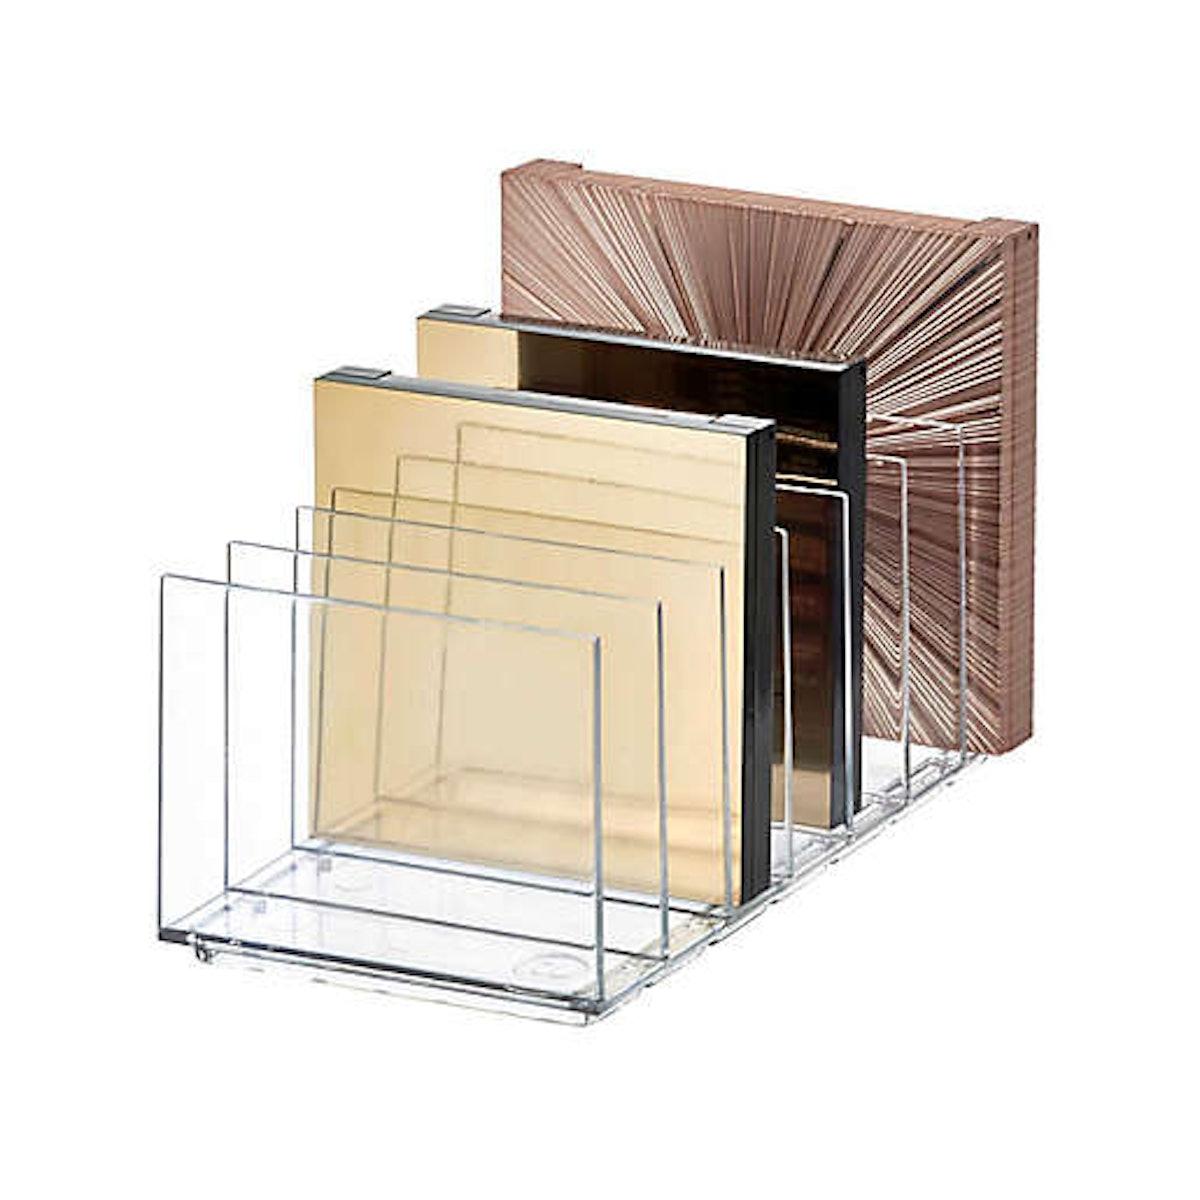 iDesign Cosmetic Palette Organizer